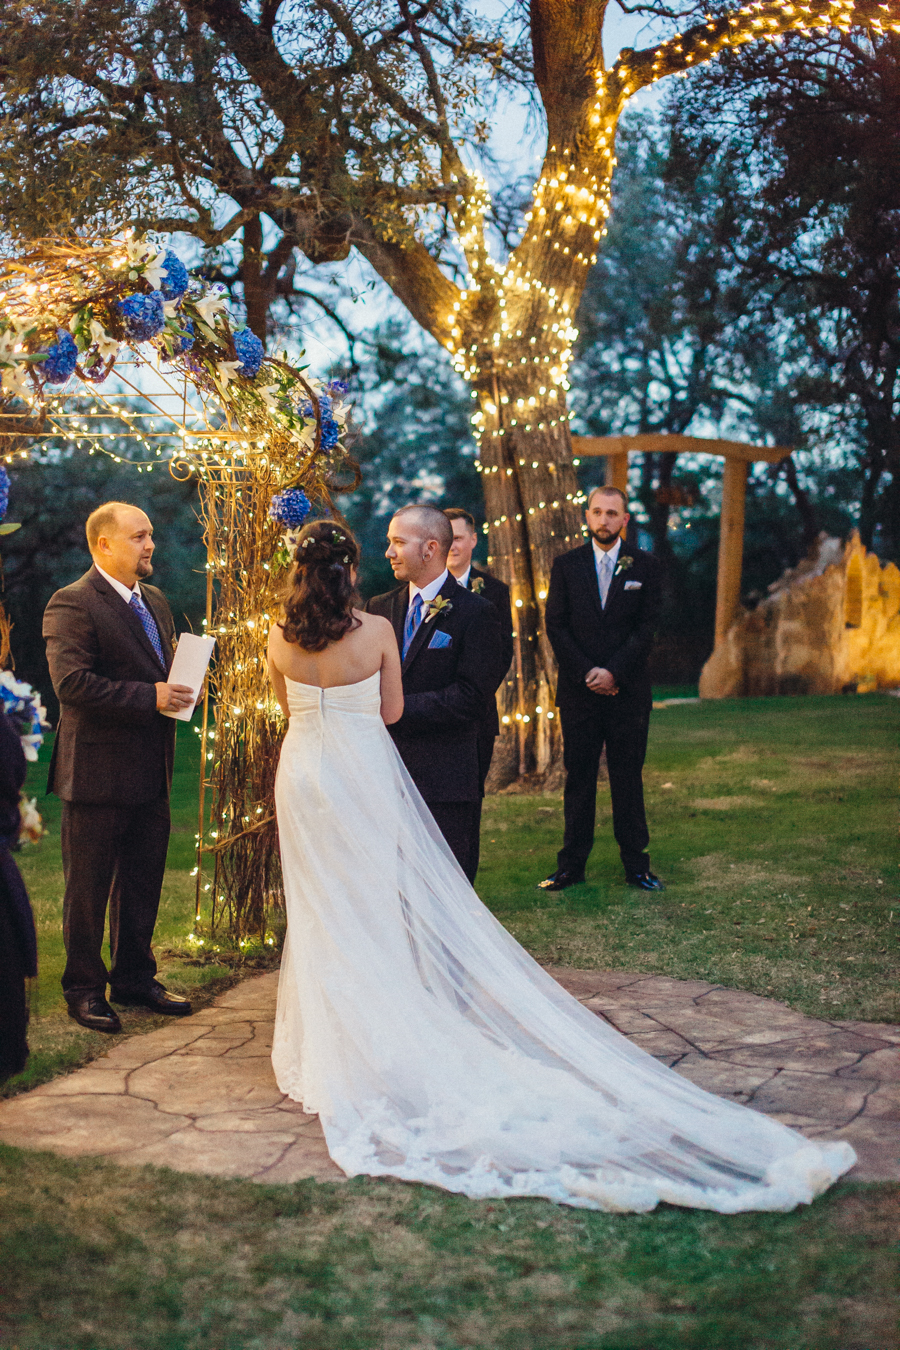 JF-wedding-cbarronjr-3527.jpg